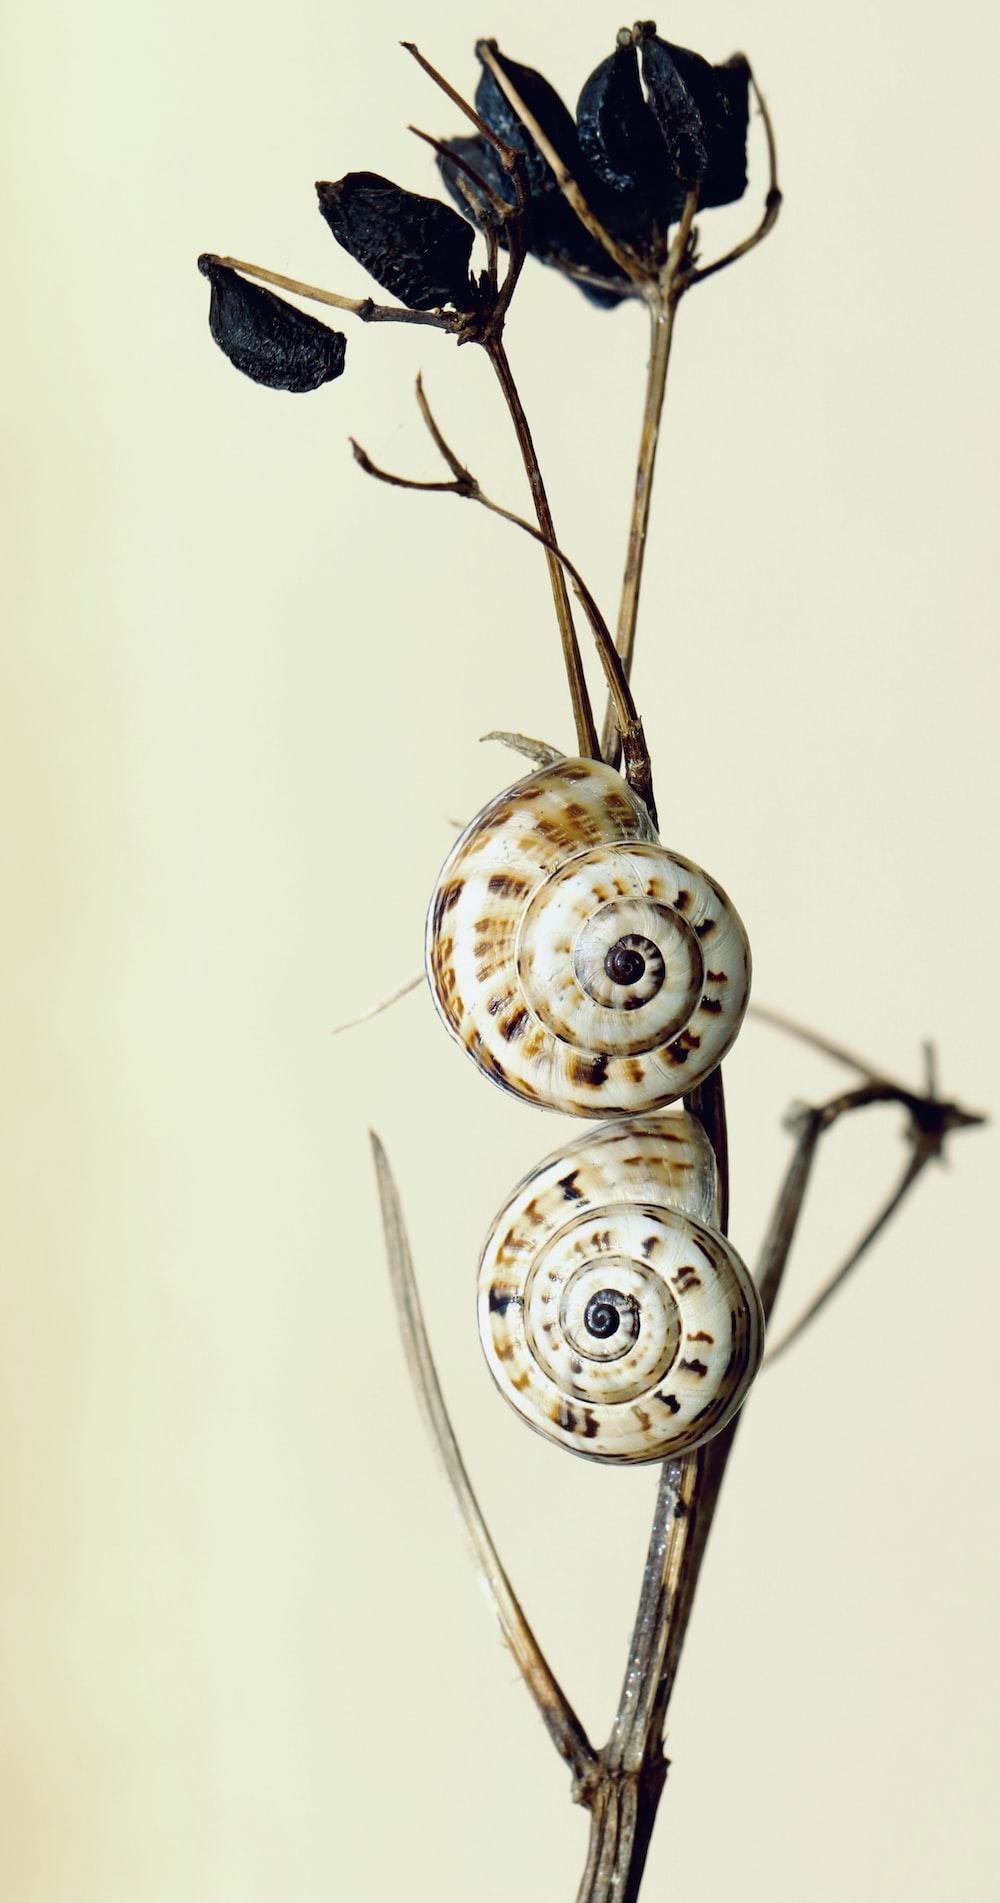 white and black round ornament